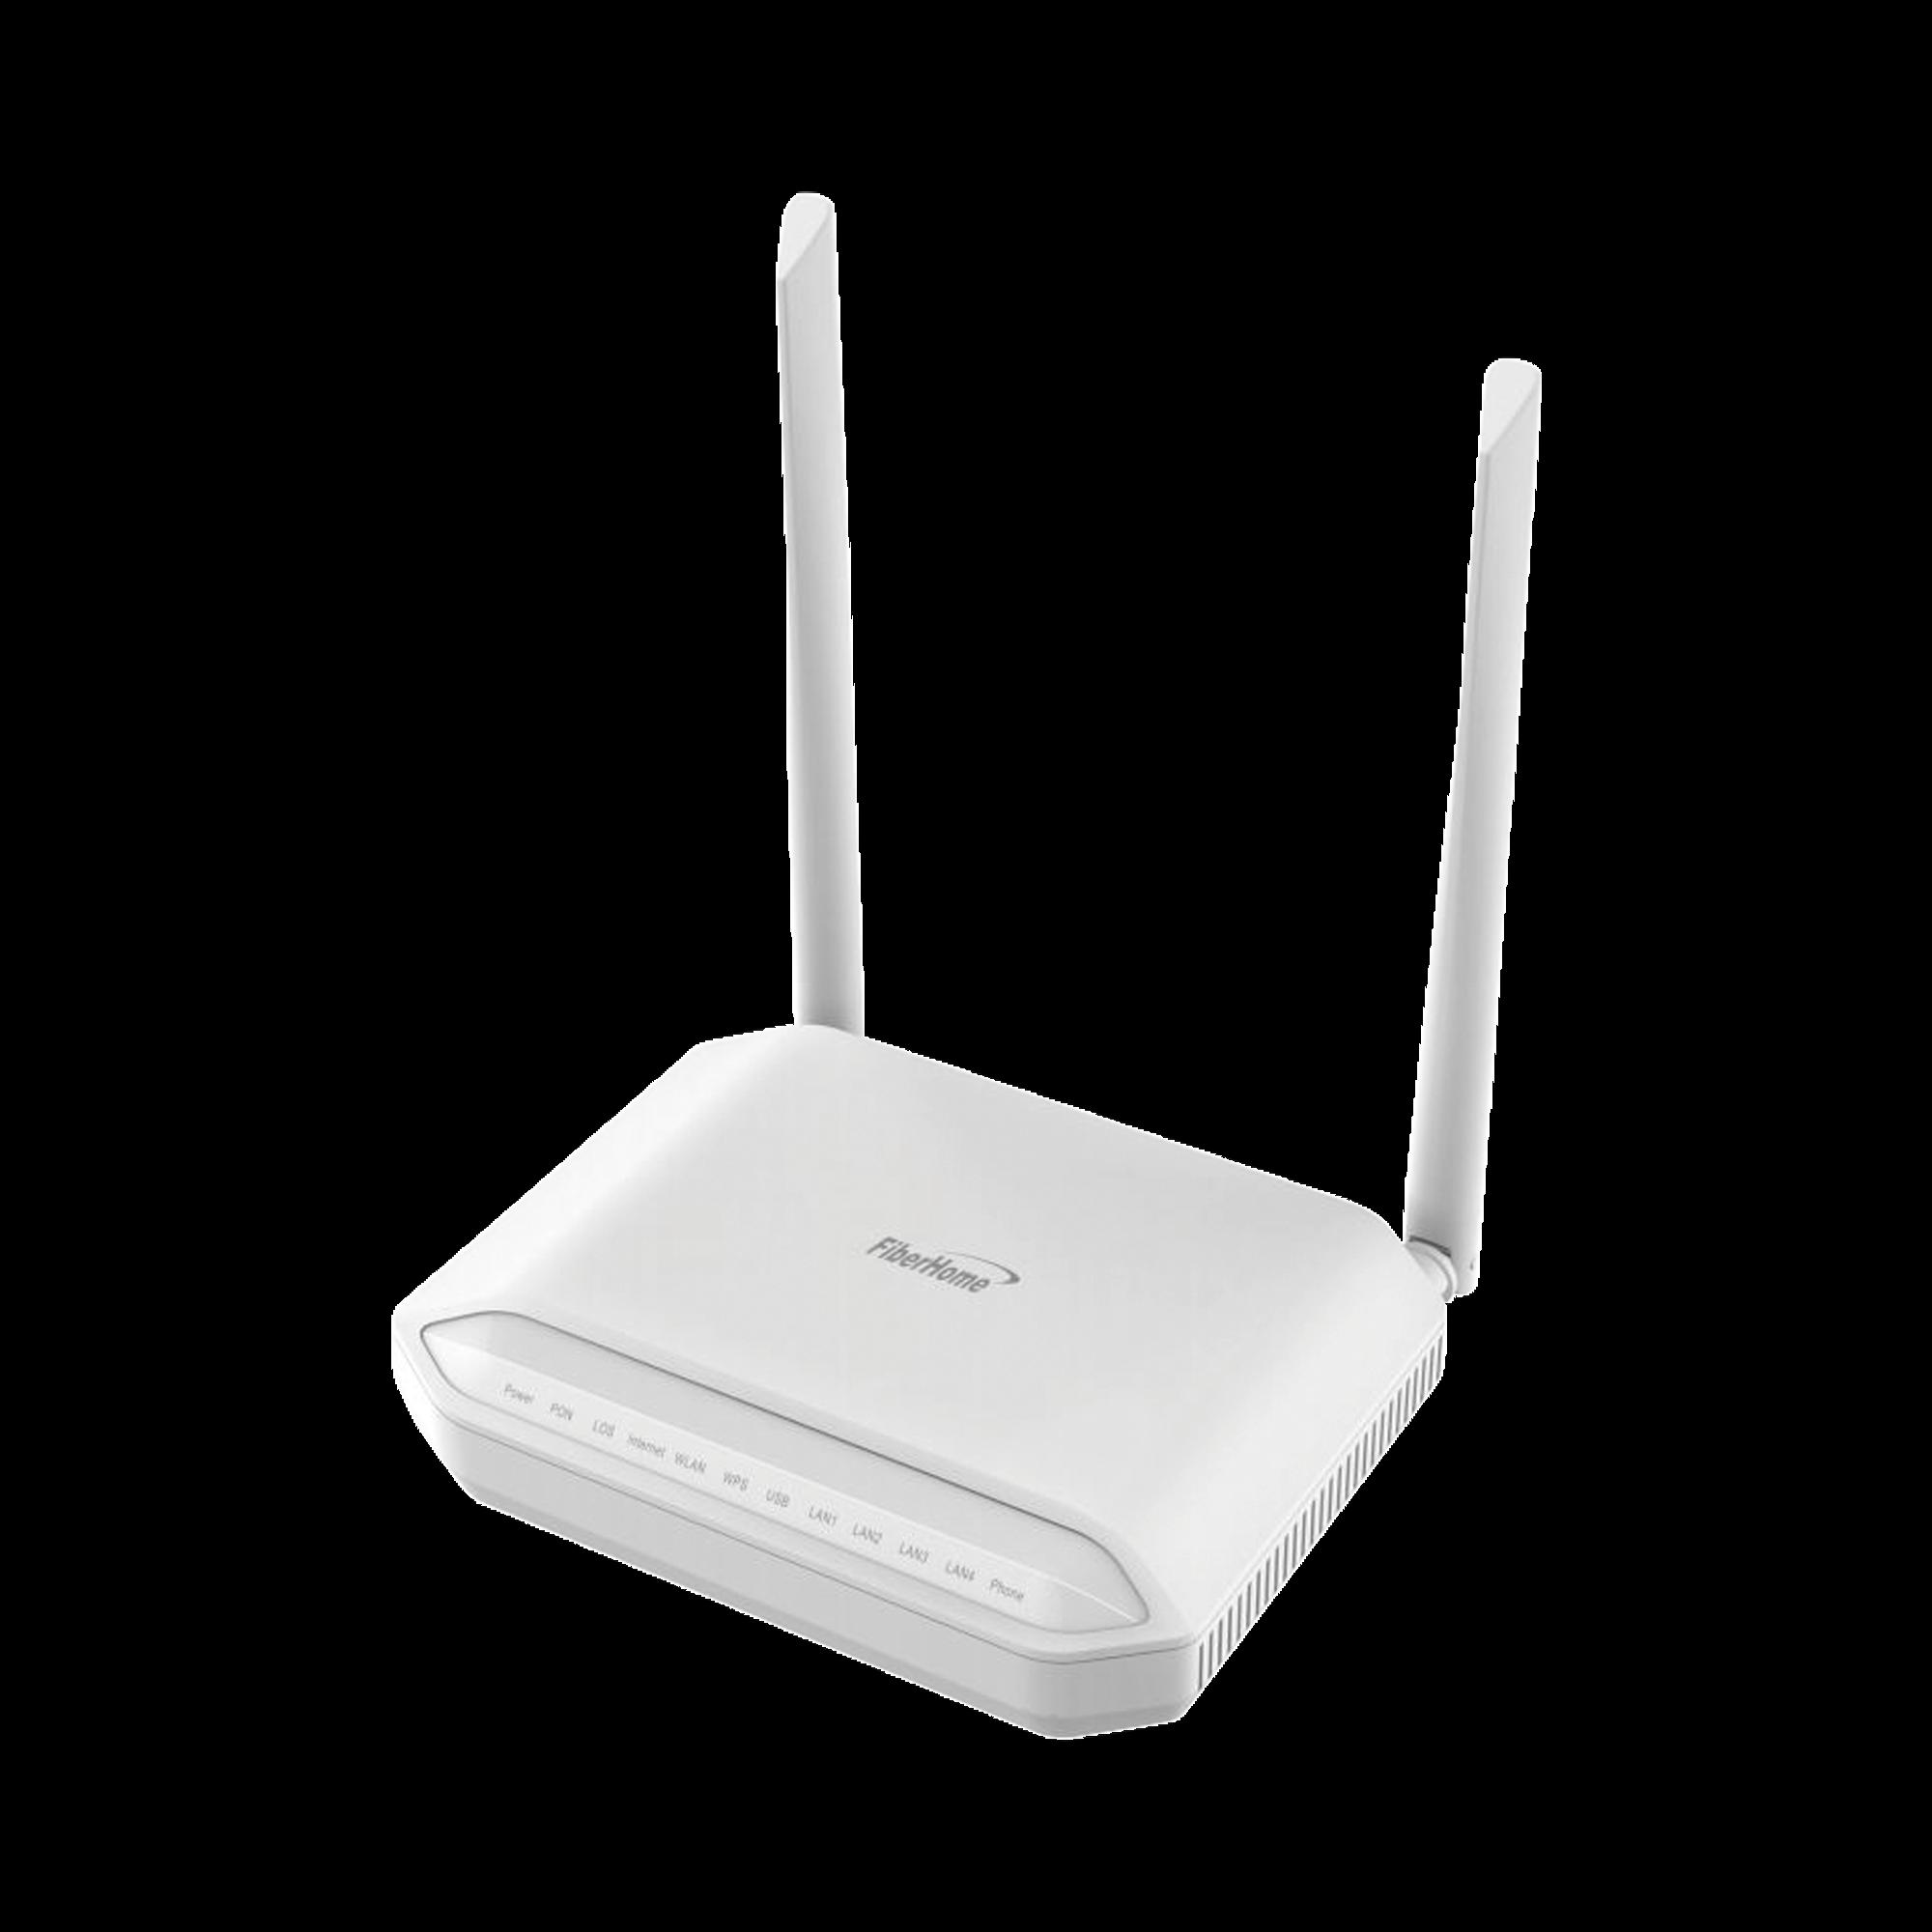 ONU GPON, WiFi 2.4 GHz, 2 Puertos Gigabit + 2 Puertos Fast Ethernet, conector SC/UPC